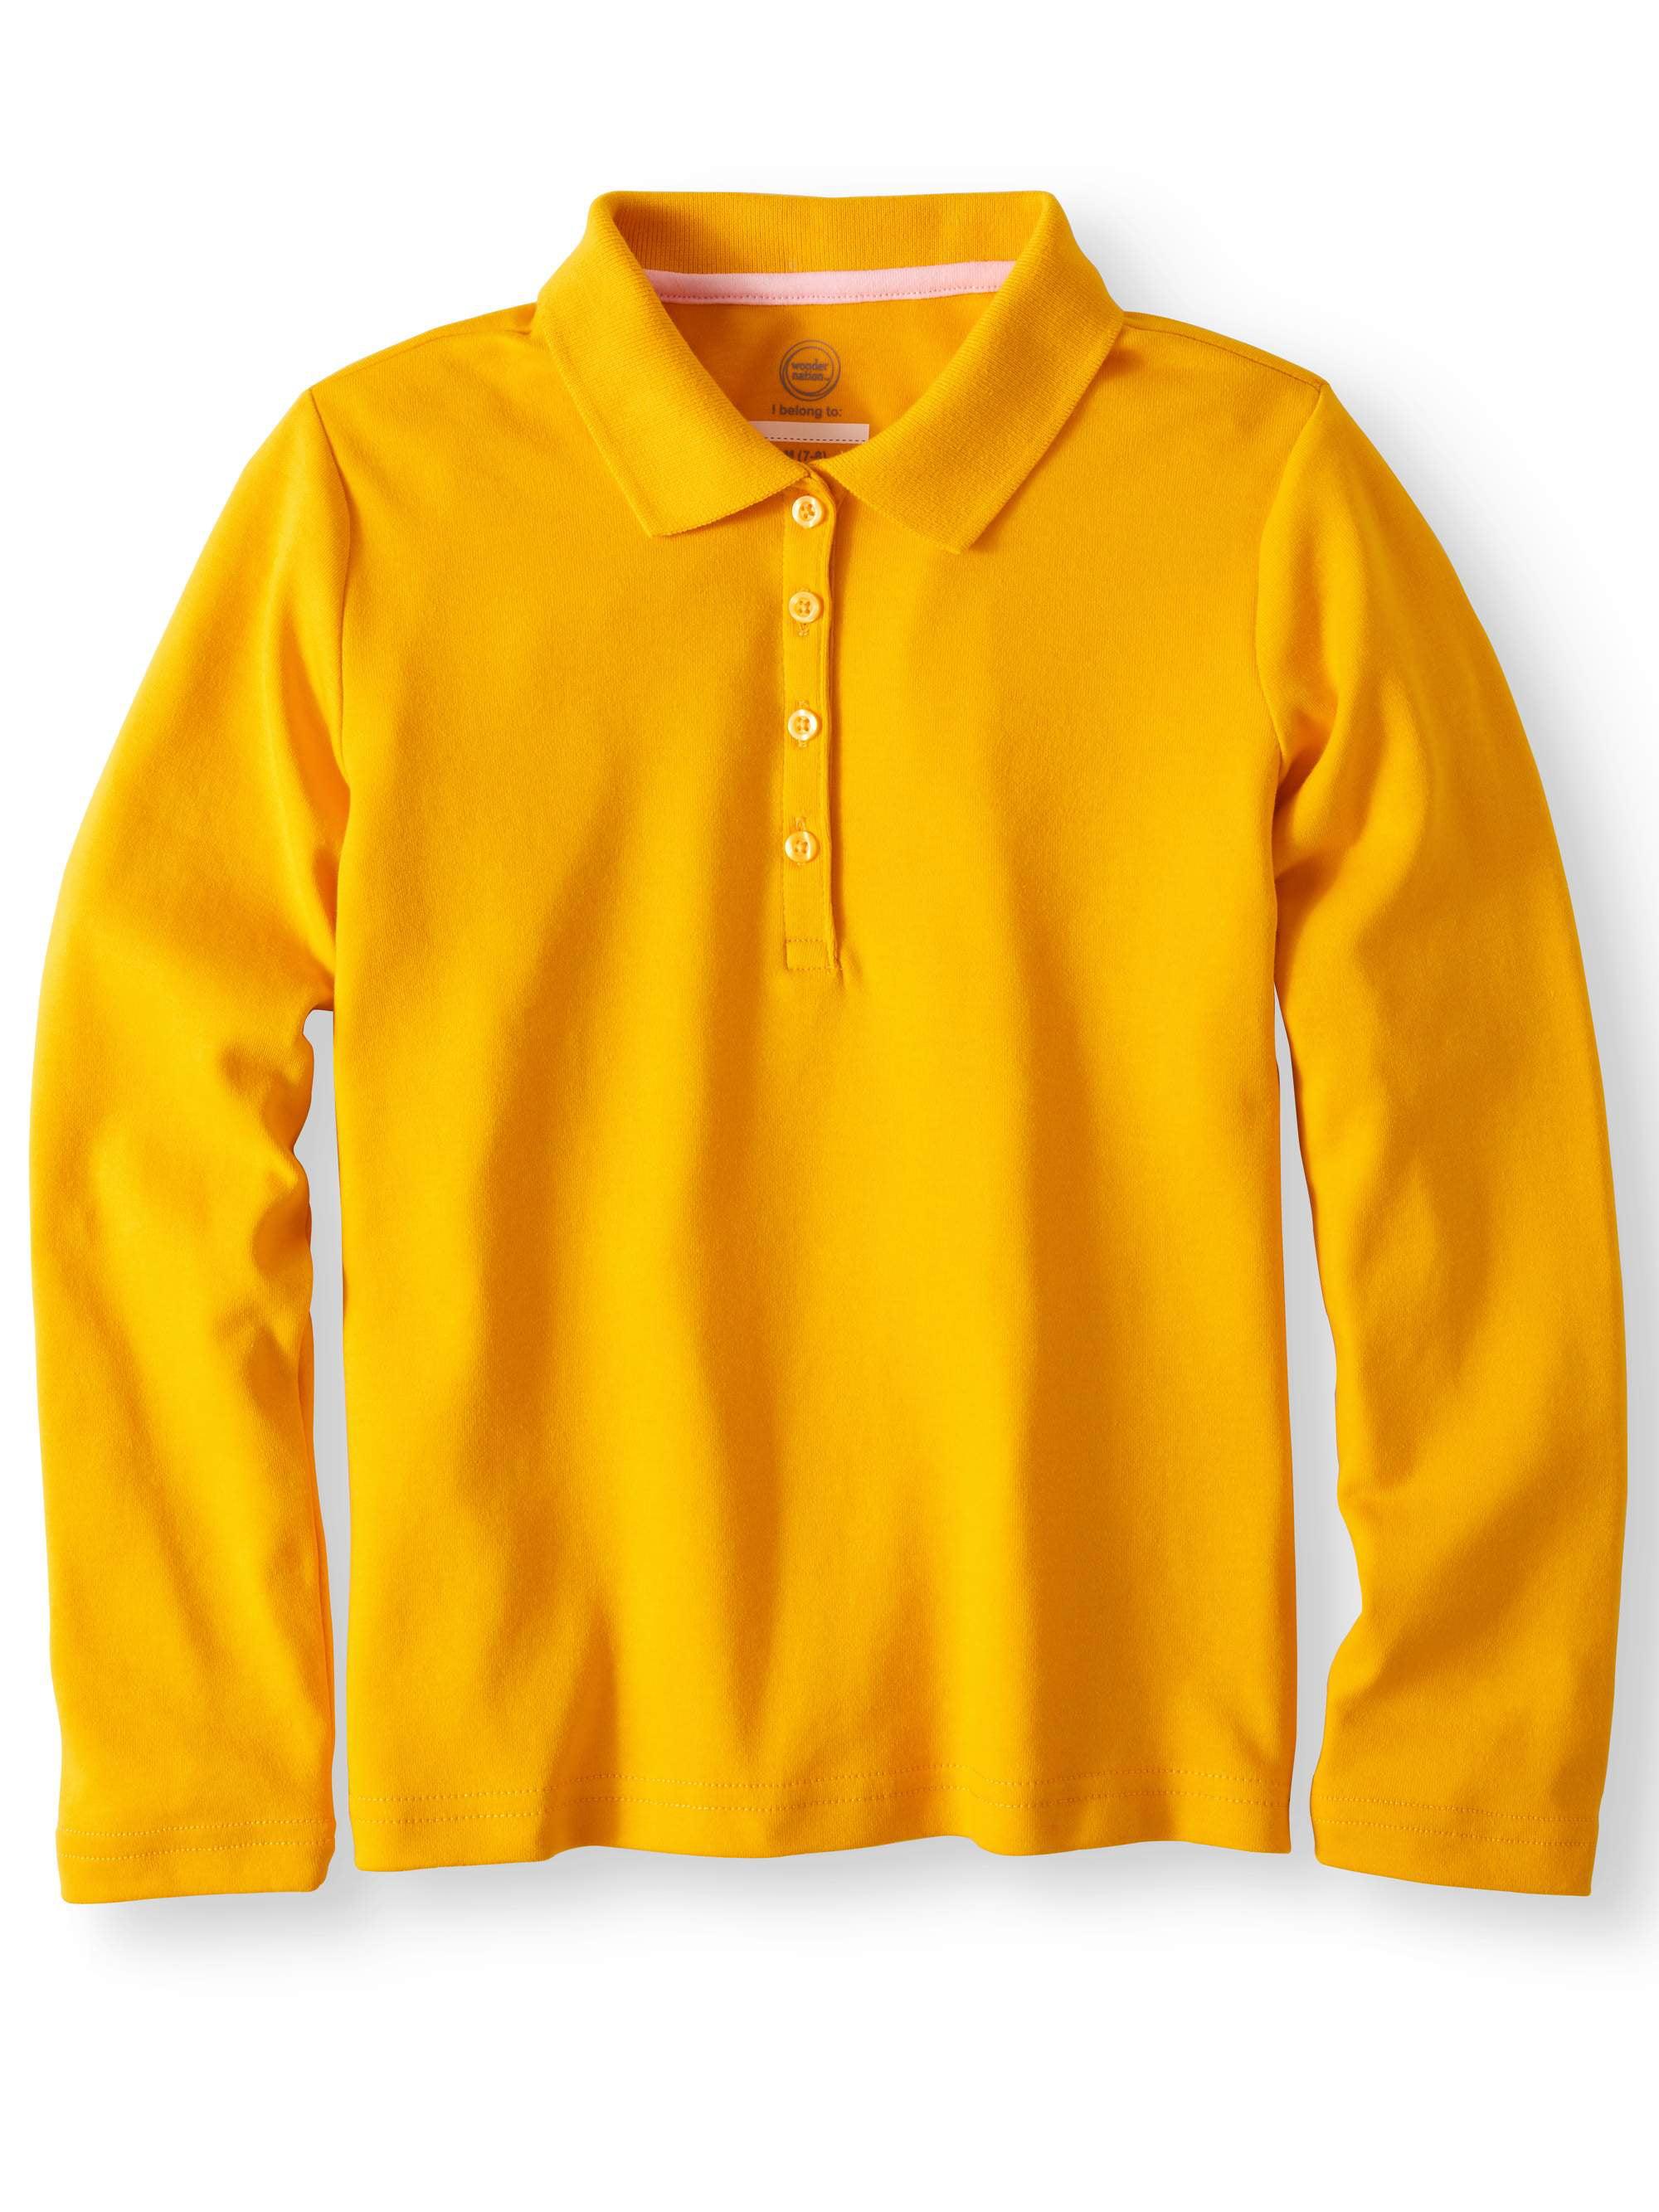 Girls School Uniform Long Sleeve Interlock Polo